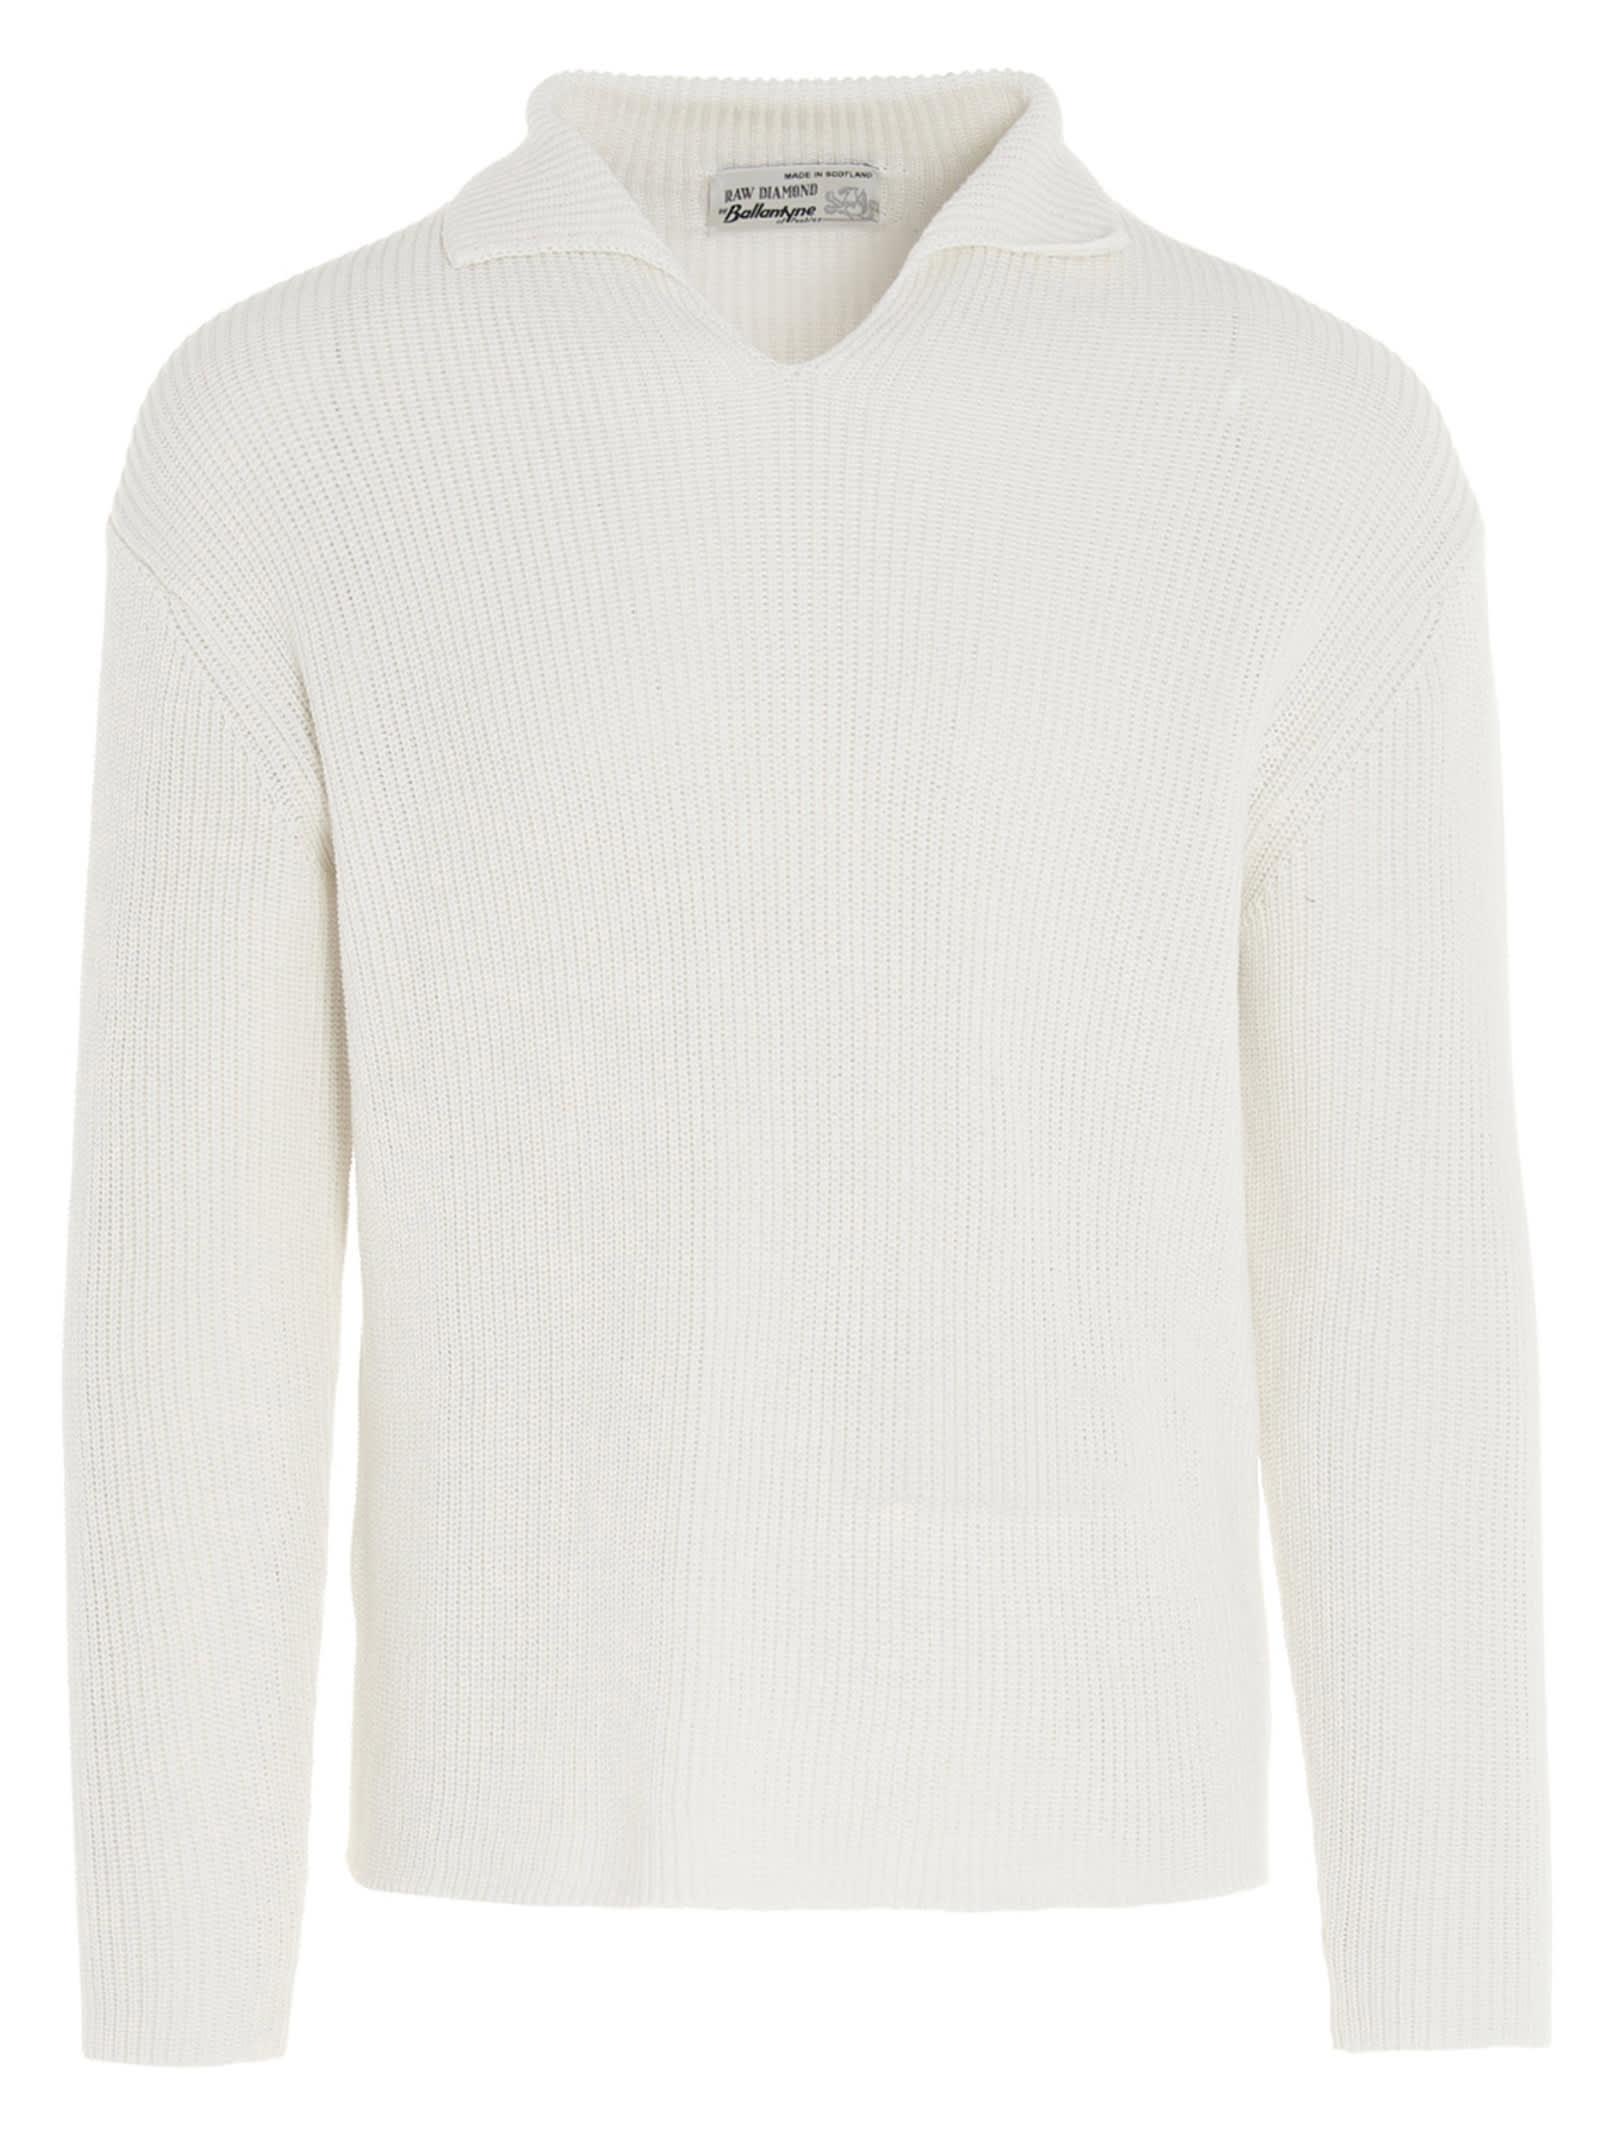 Capsule Raw Diamond Sweater